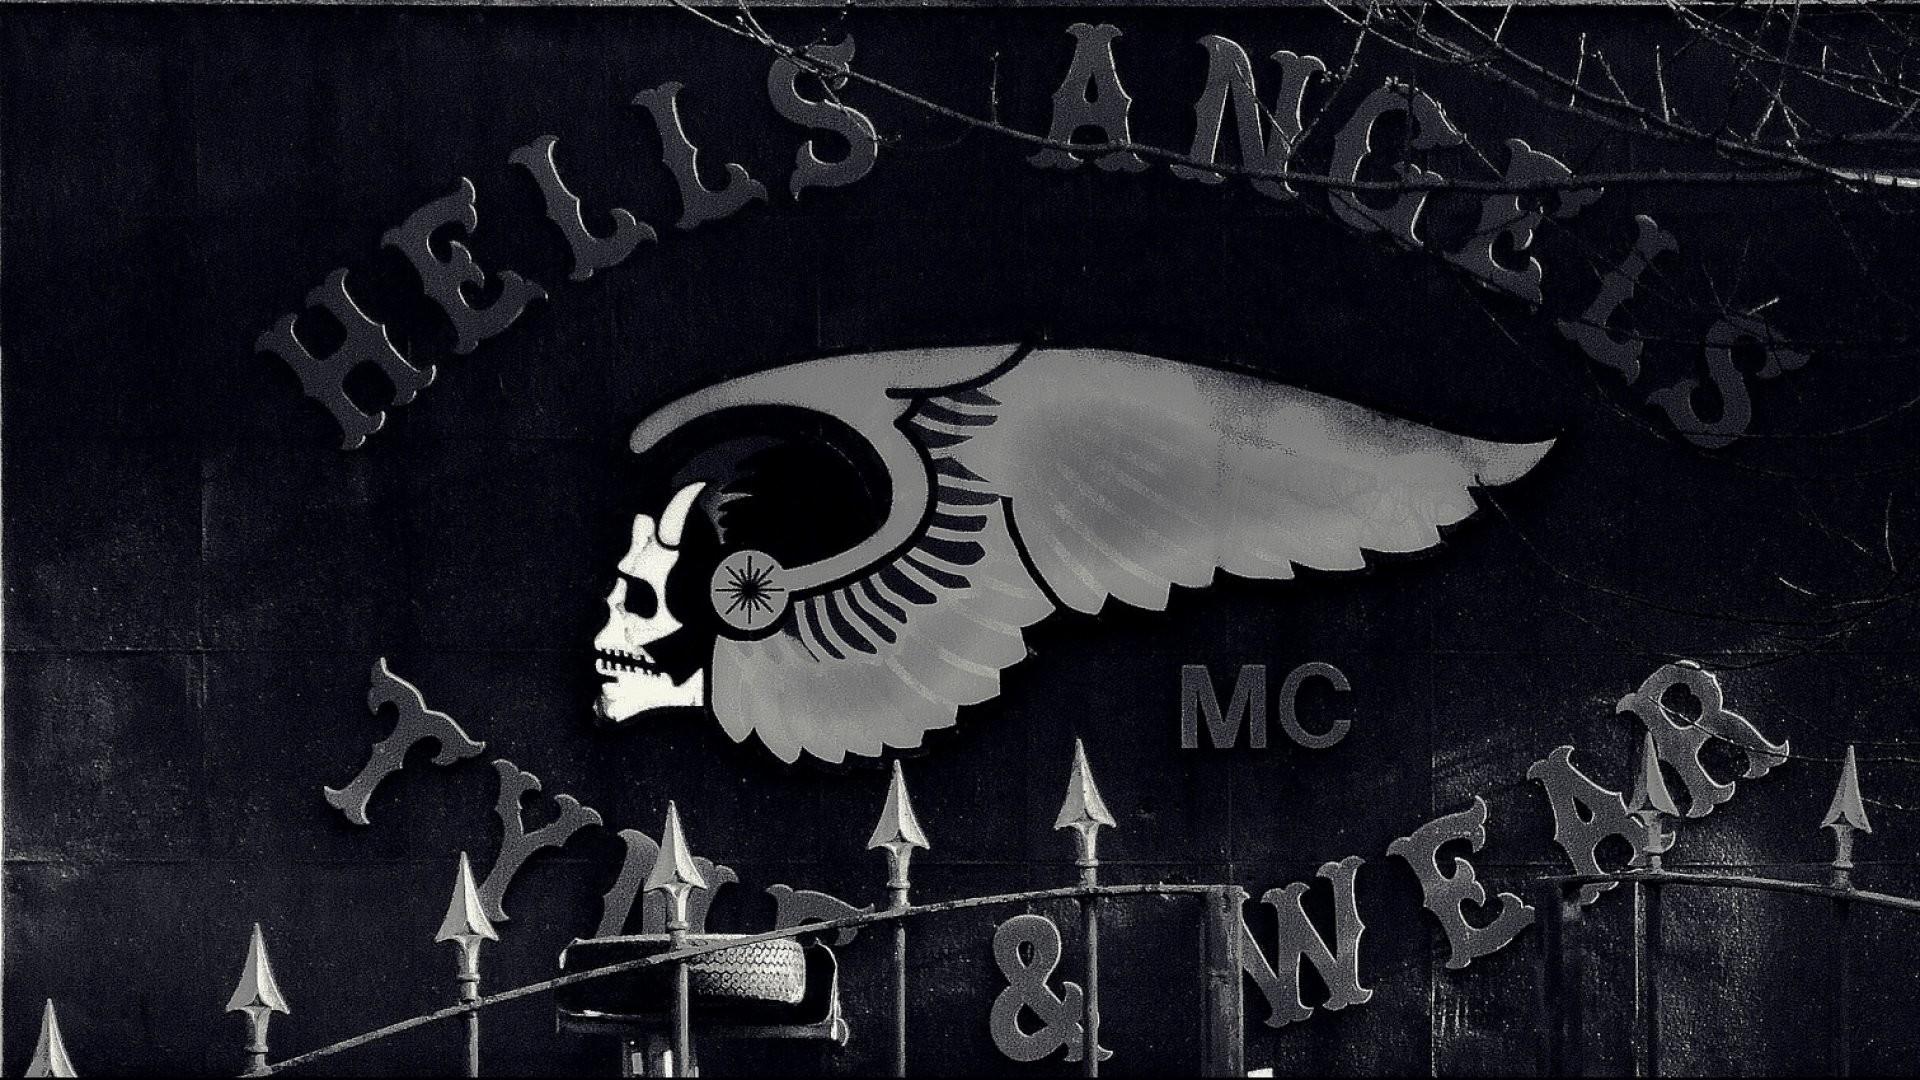 … s angels wallpapers wallpaperup …